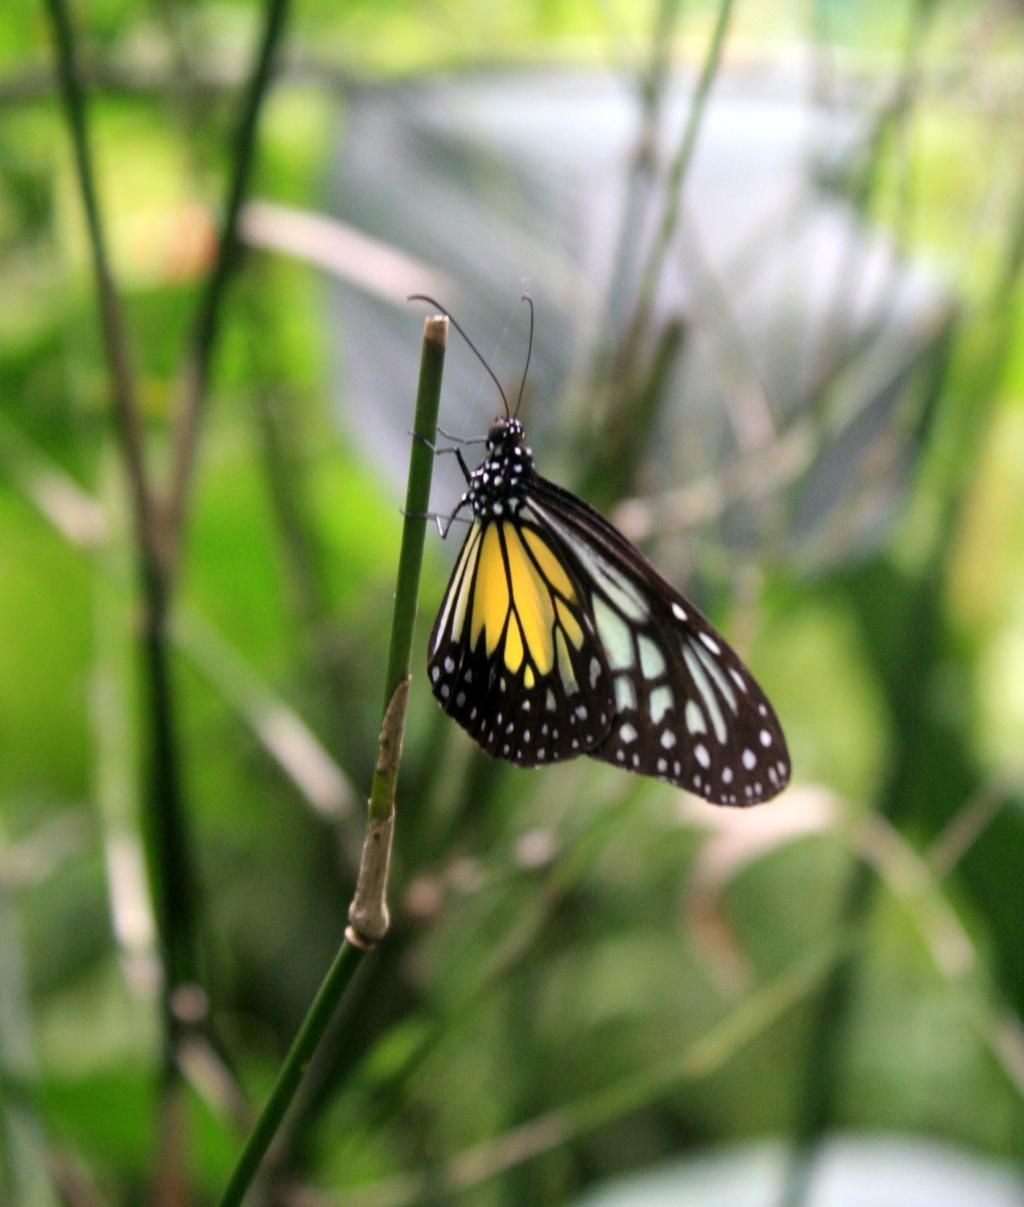 Kuala Lumpur Butterfly Park Butterfly park, Trip advisor